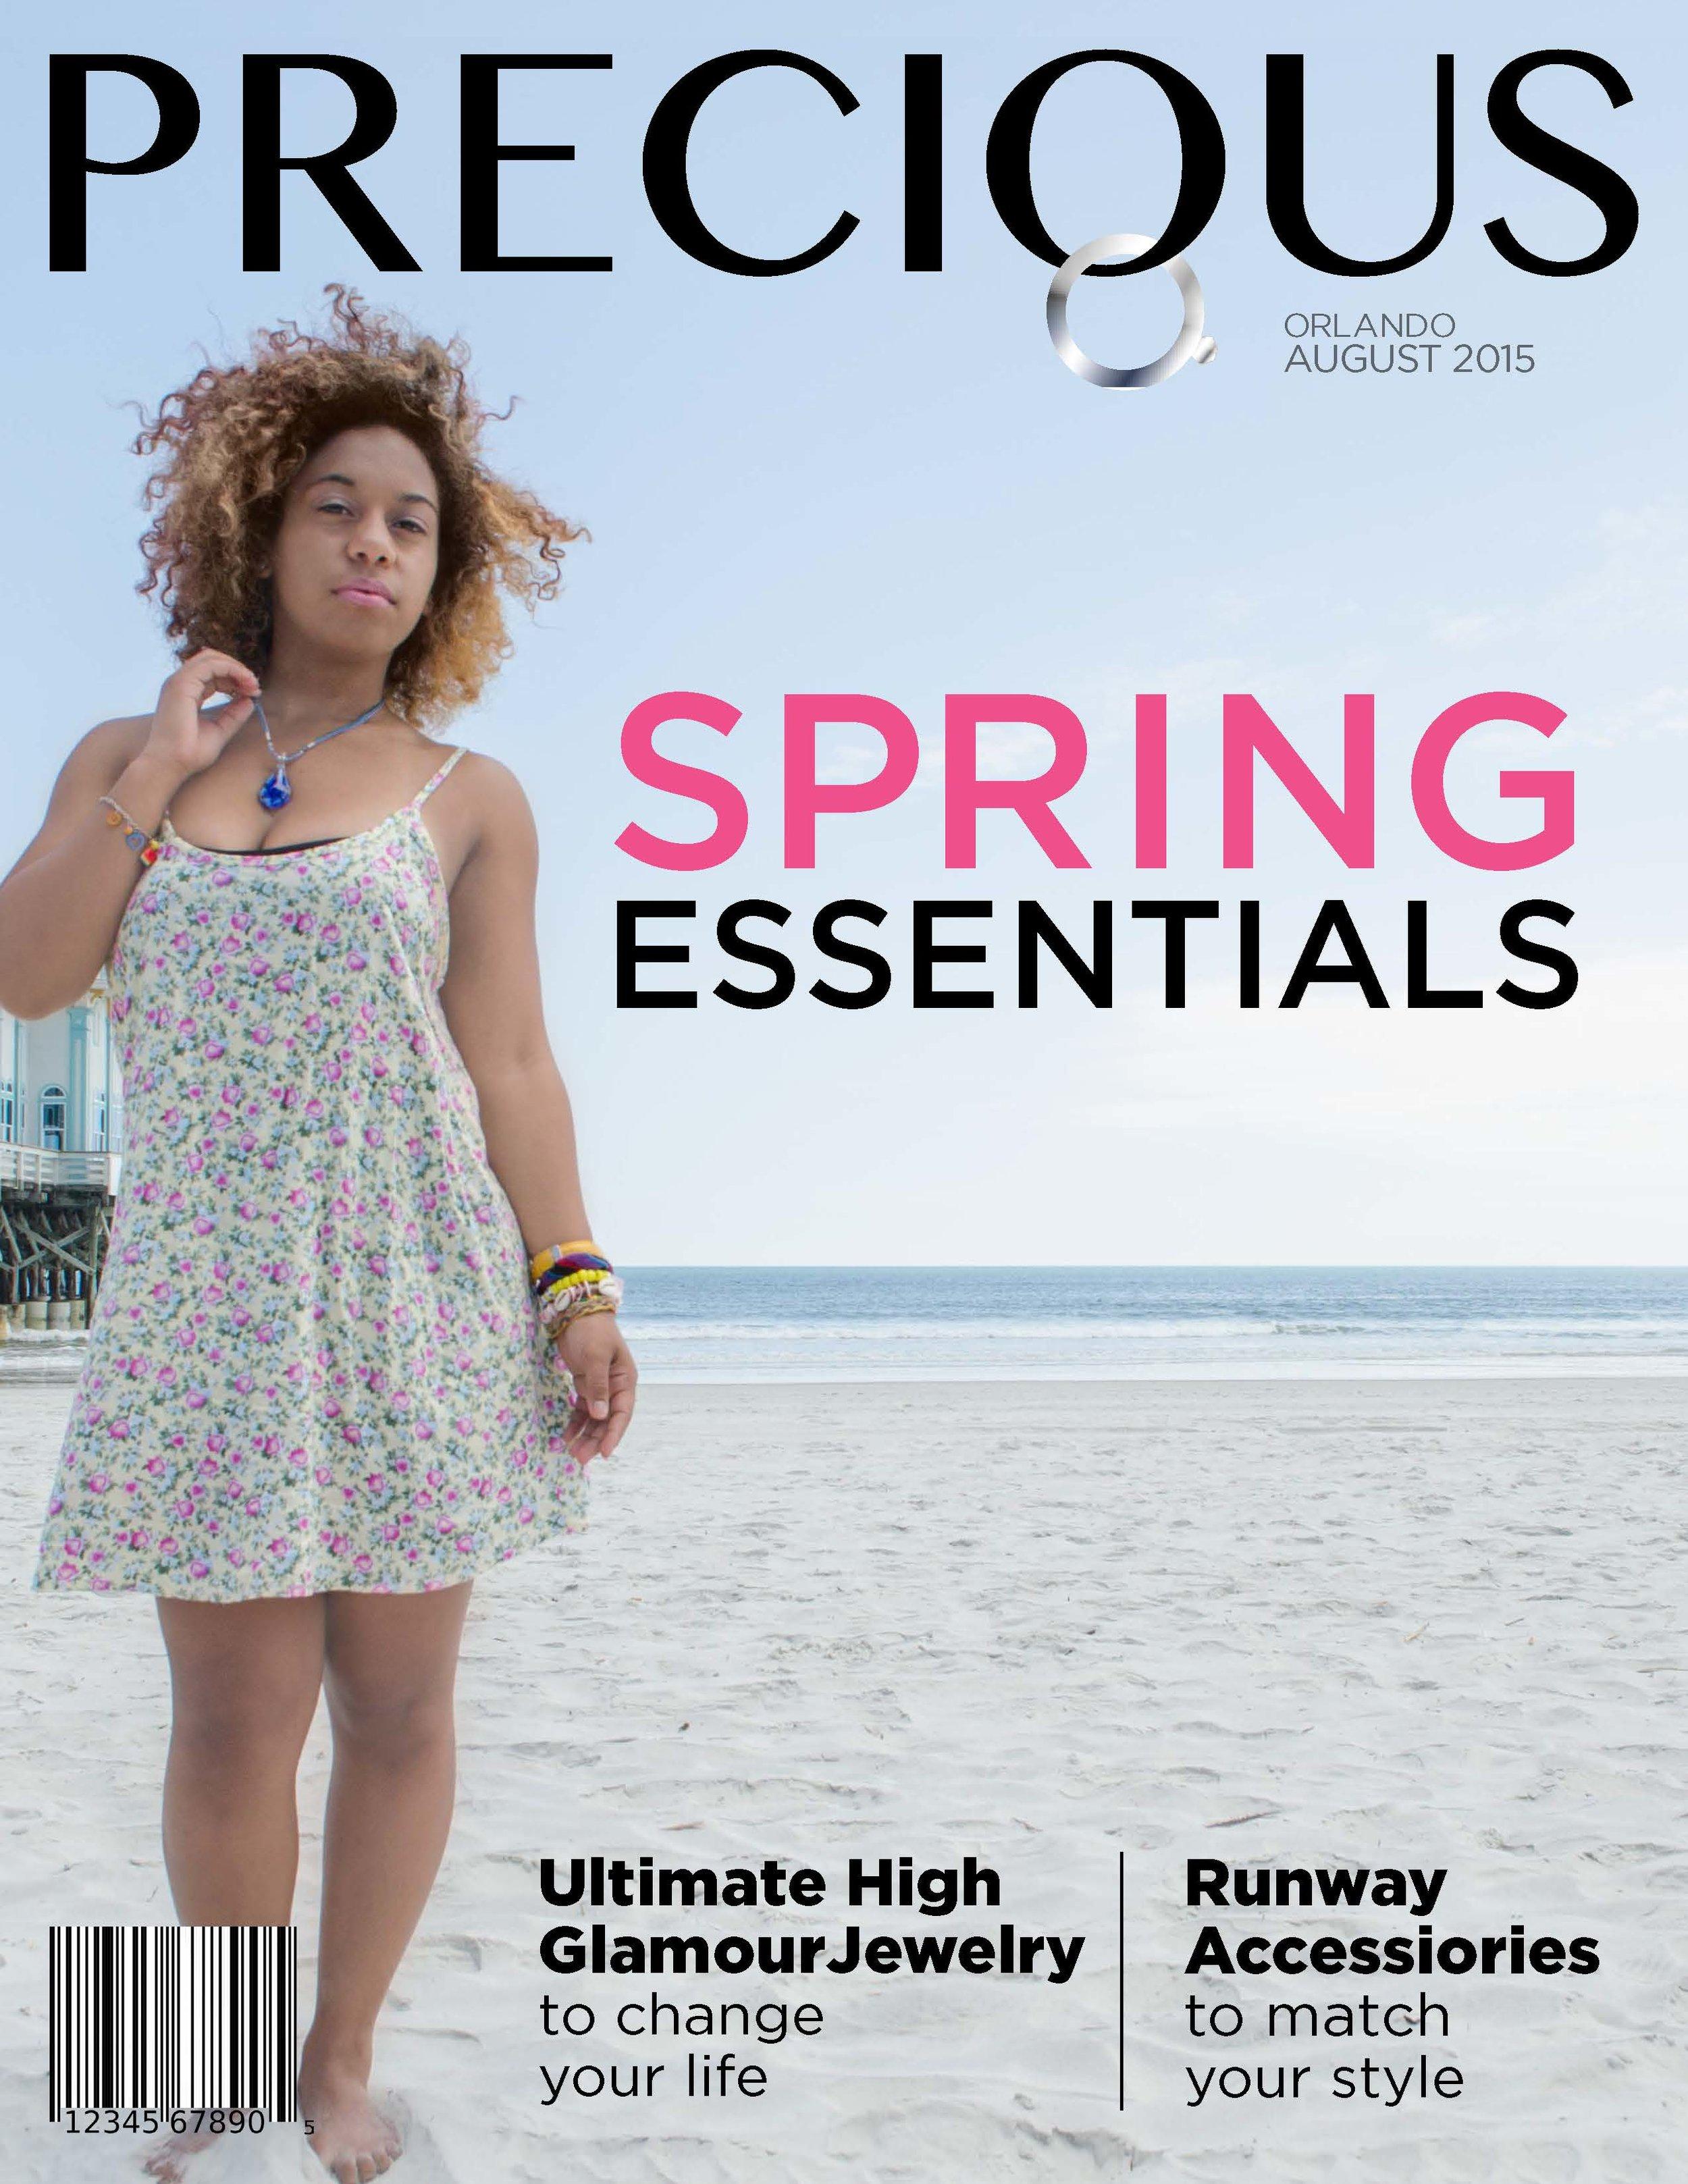 Camacho_Nallely__magazine_covers_899_Page_1.jpg